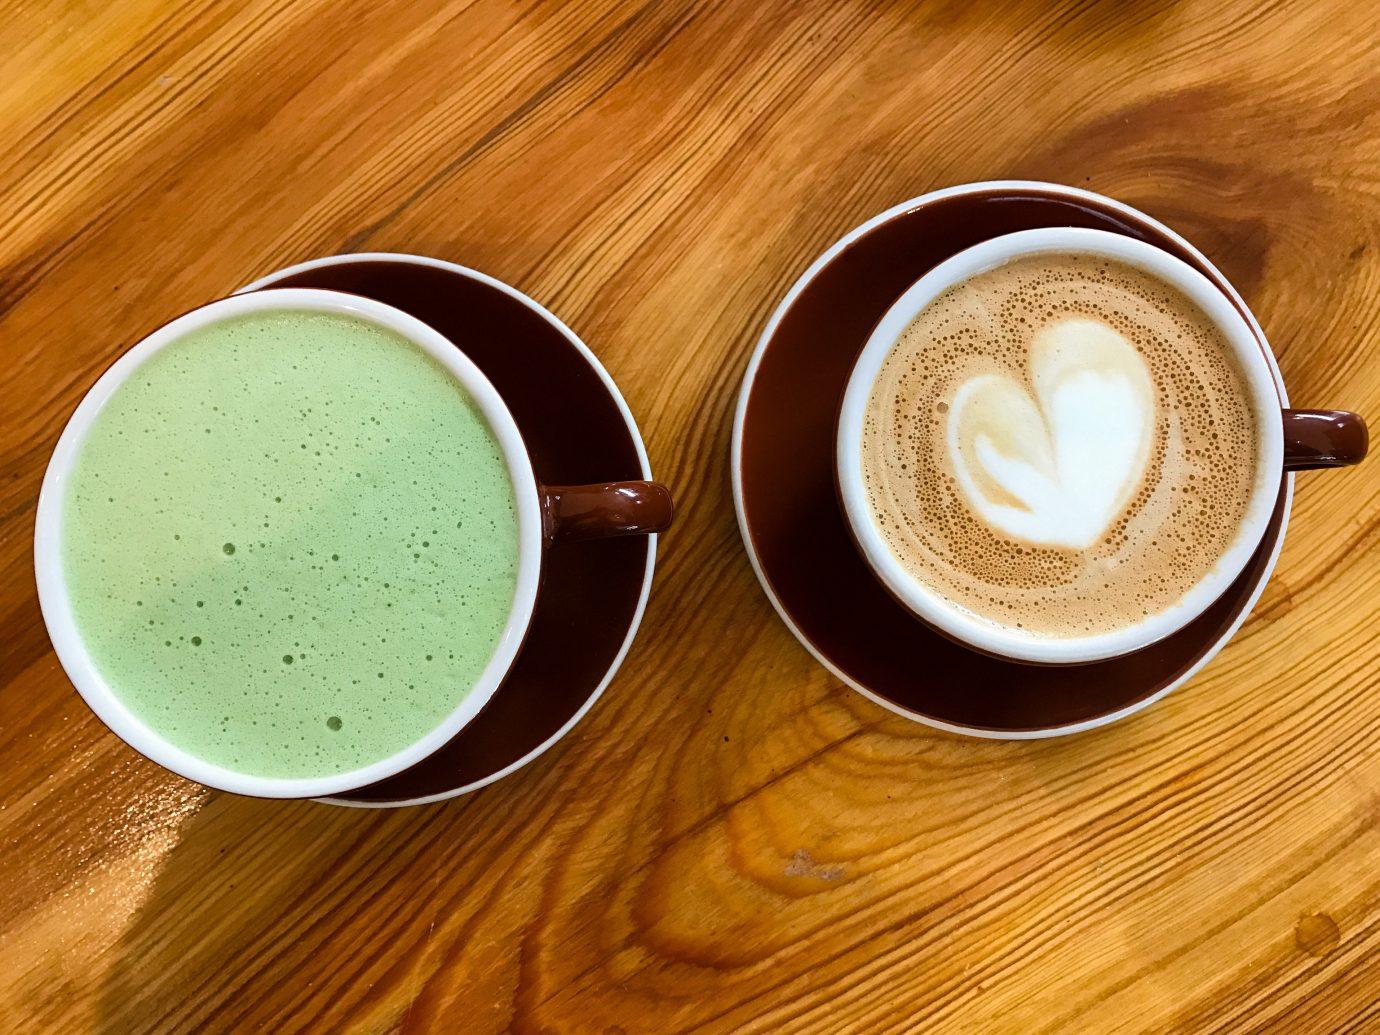 Brooklyn City Food + Drink NYC table cup coffee indoor latte food wooden coffee cup espresso café au lait cappuccino caffeine tea flat white Drink coffee milk cuban espresso caffè macchiato saucer instant coffee mocaccino beverage doppio